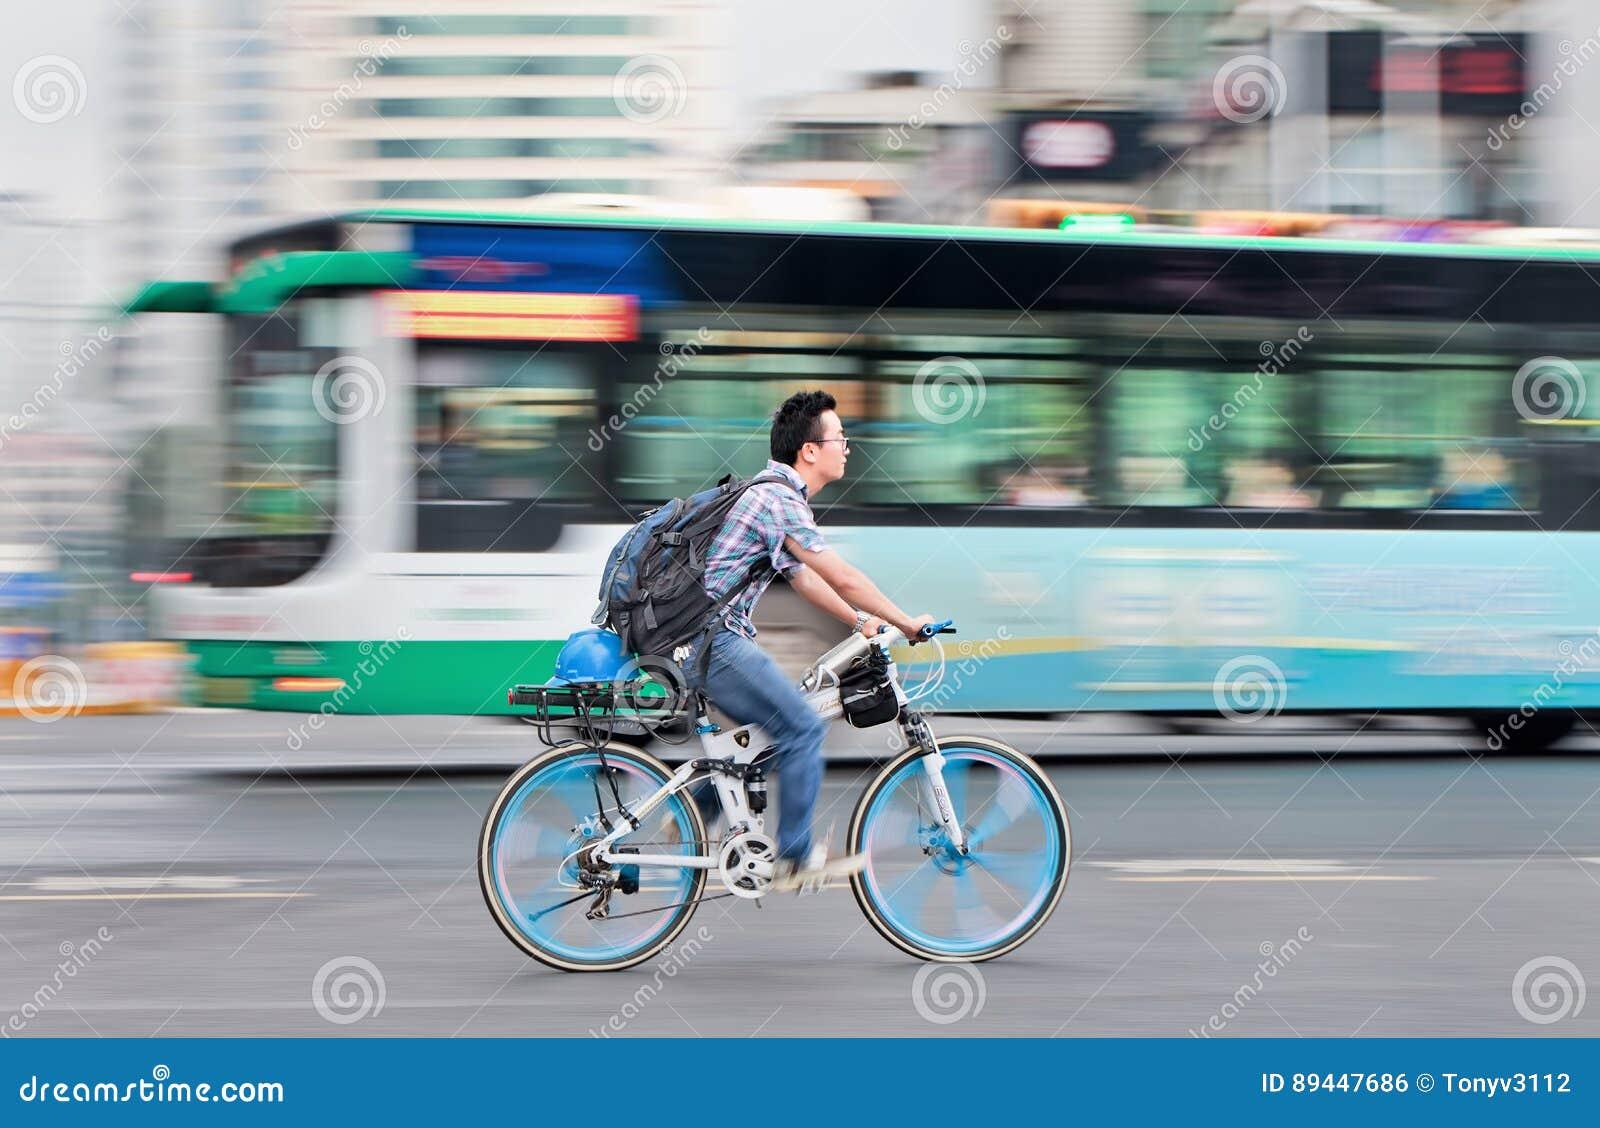 dsc review urgestalt bike reviews o lightweight news lamborghini road